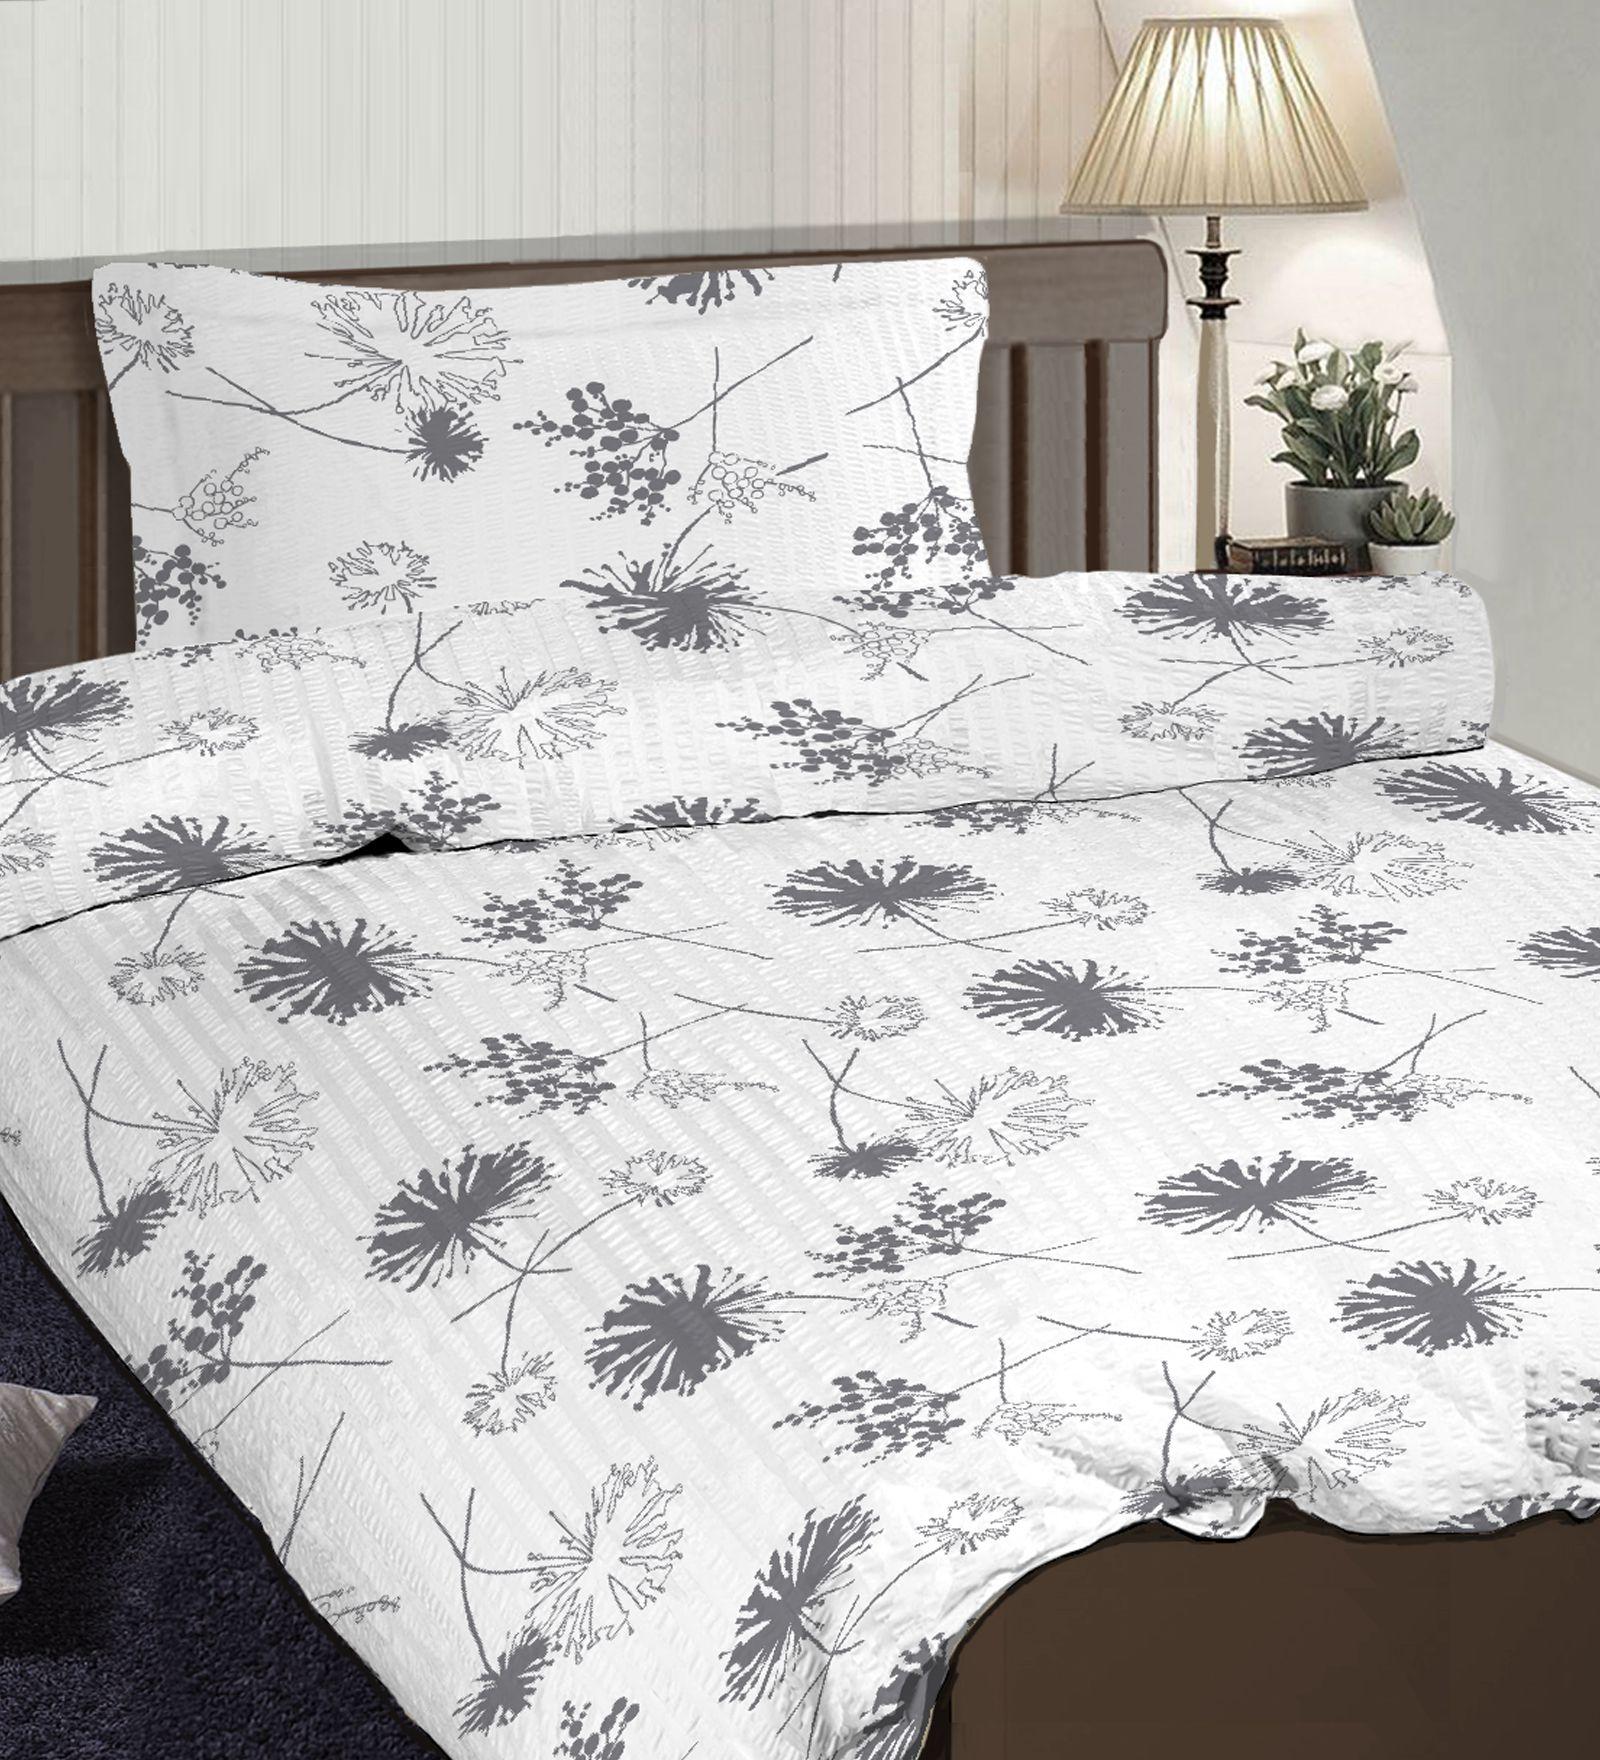 Pizuna Linens Single Cotton Gray Floral Dohar